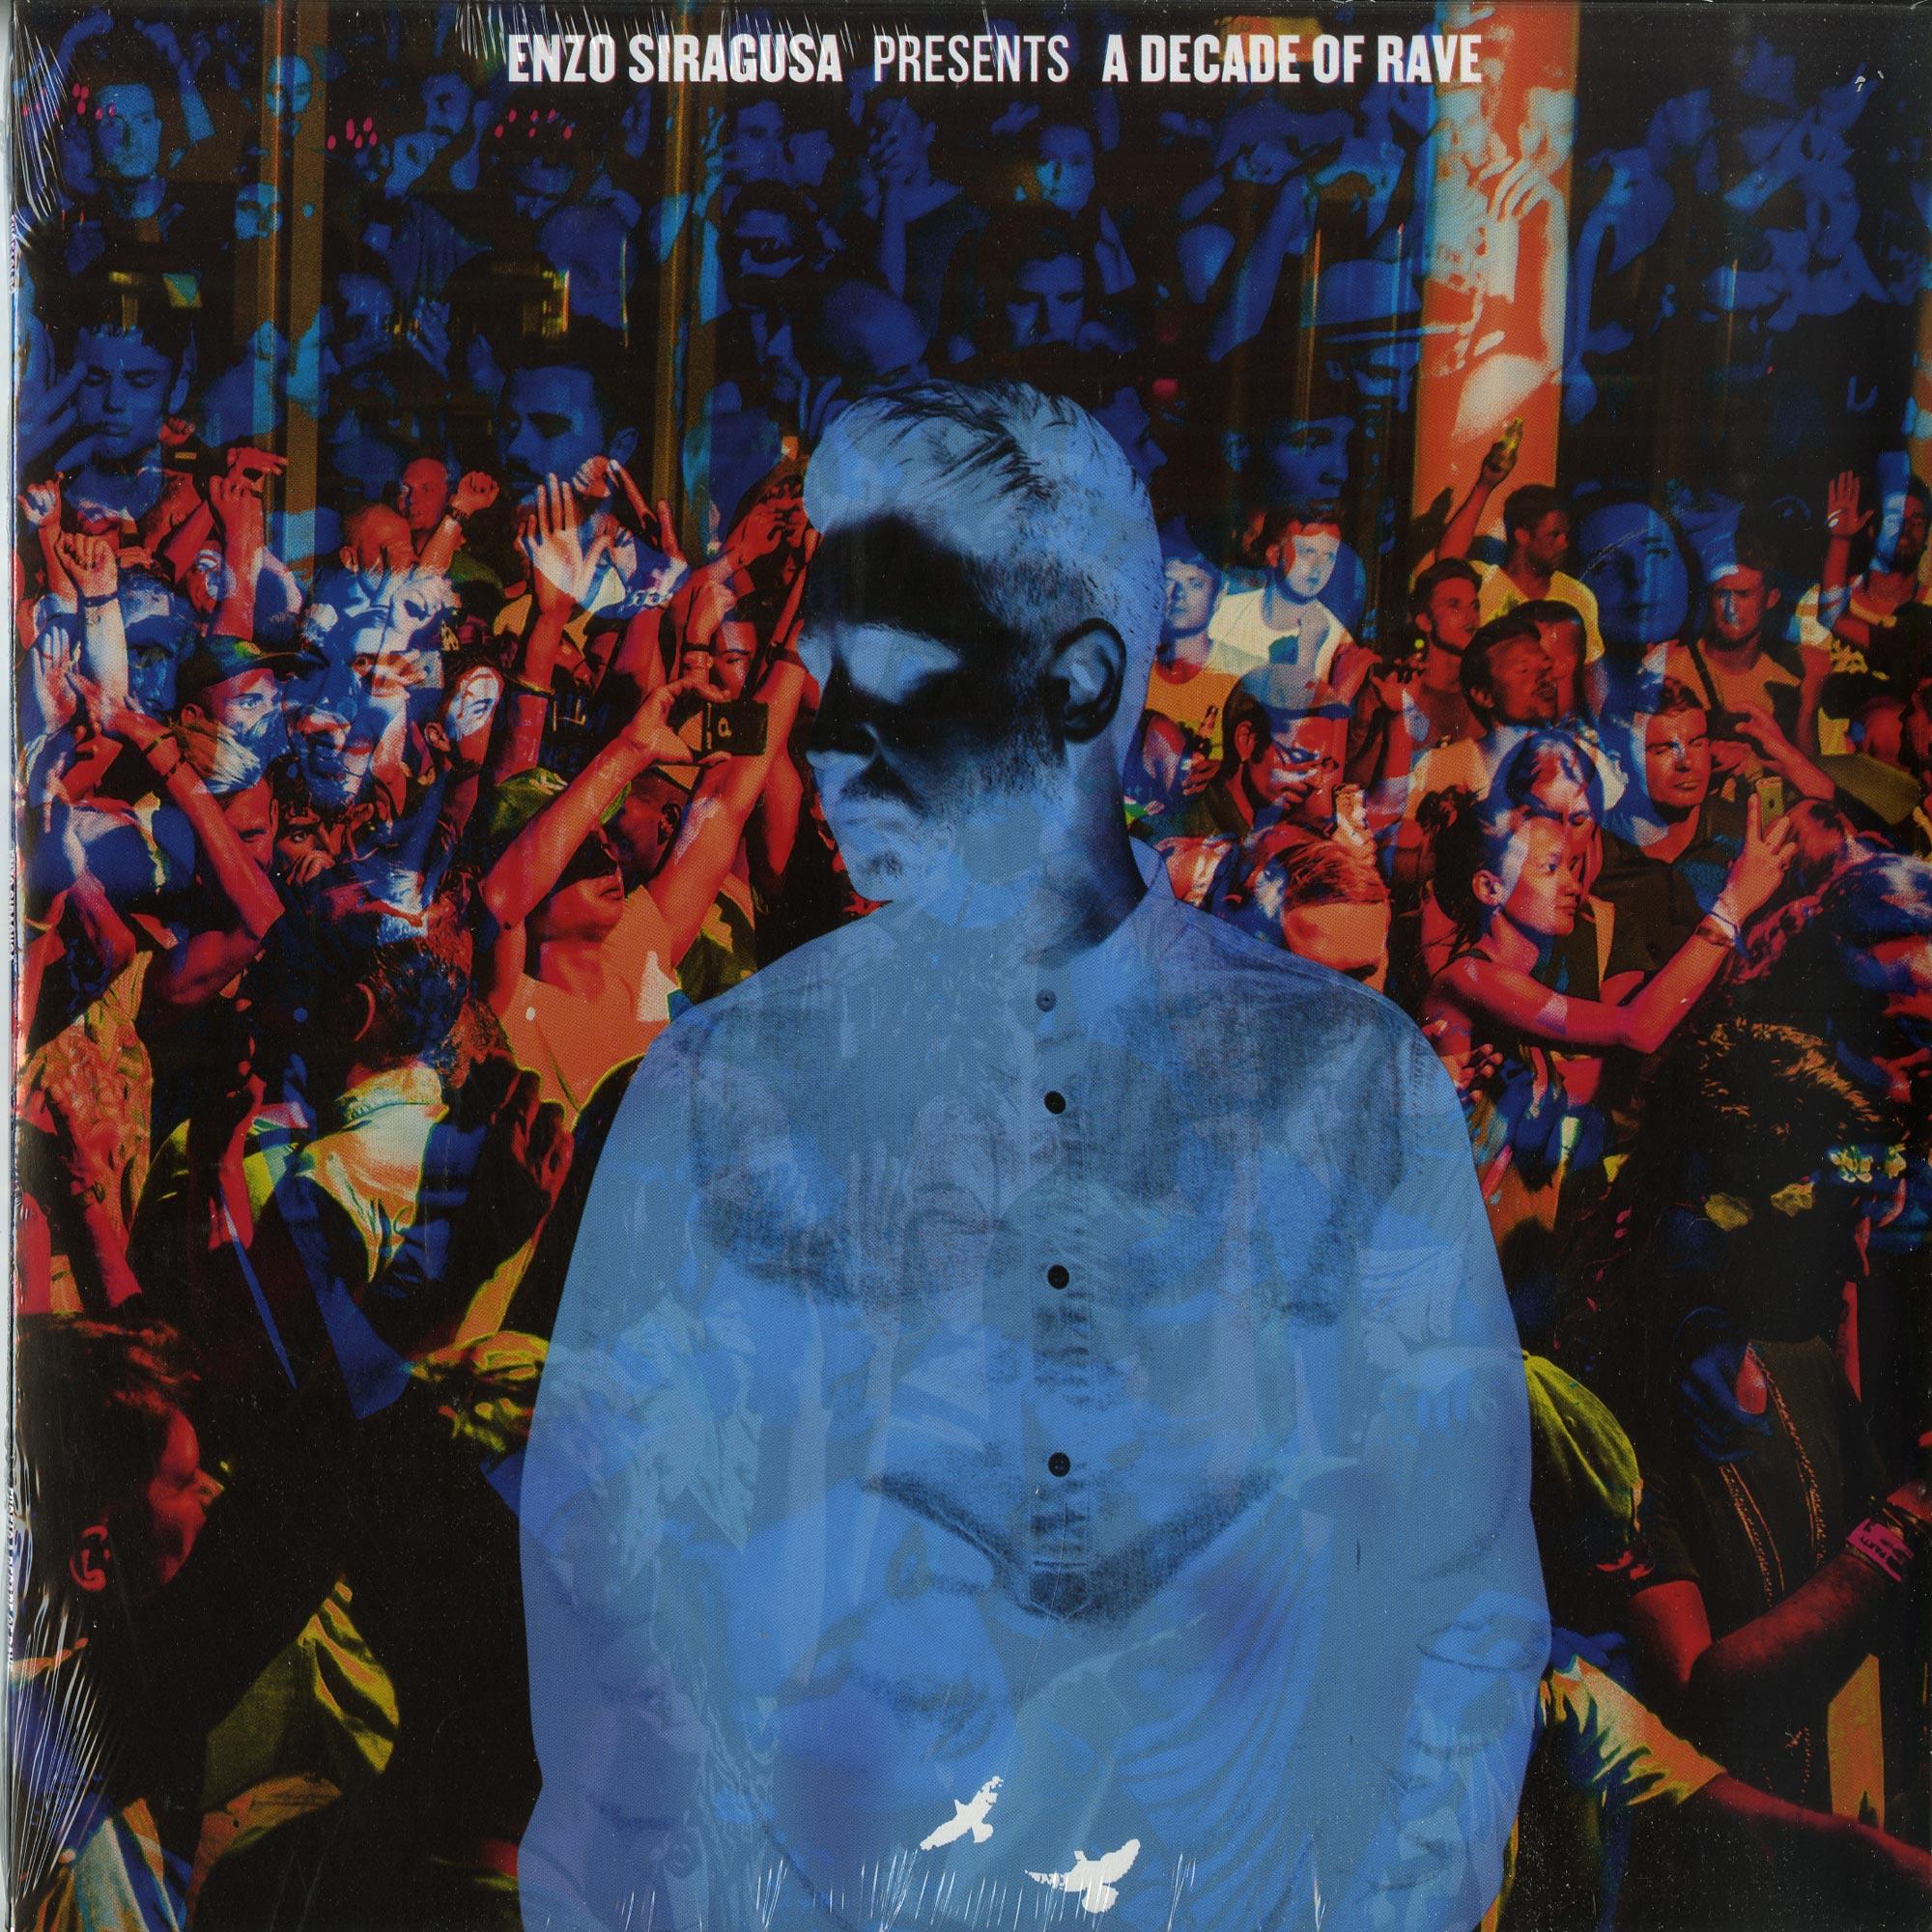 Enzo Siragusa presents - A Decade of Rave Volume 2